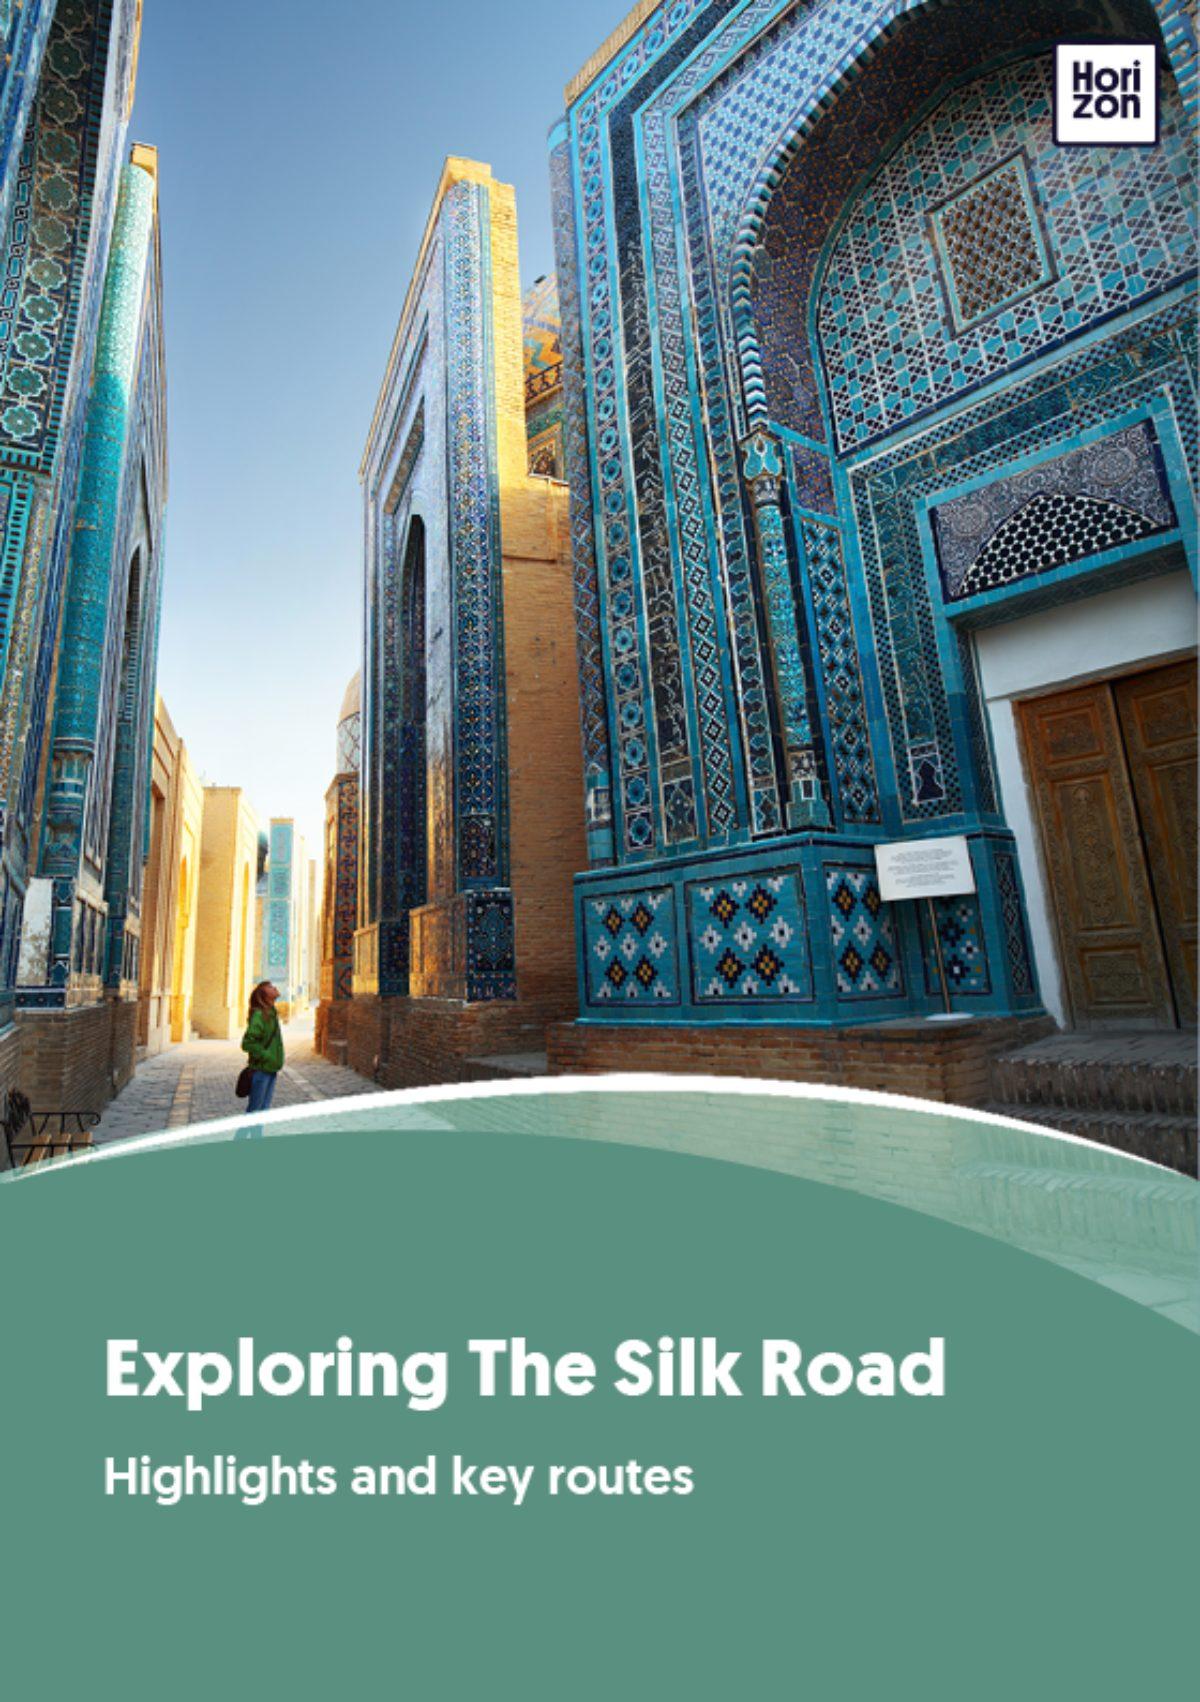 Exploring The Silk Road